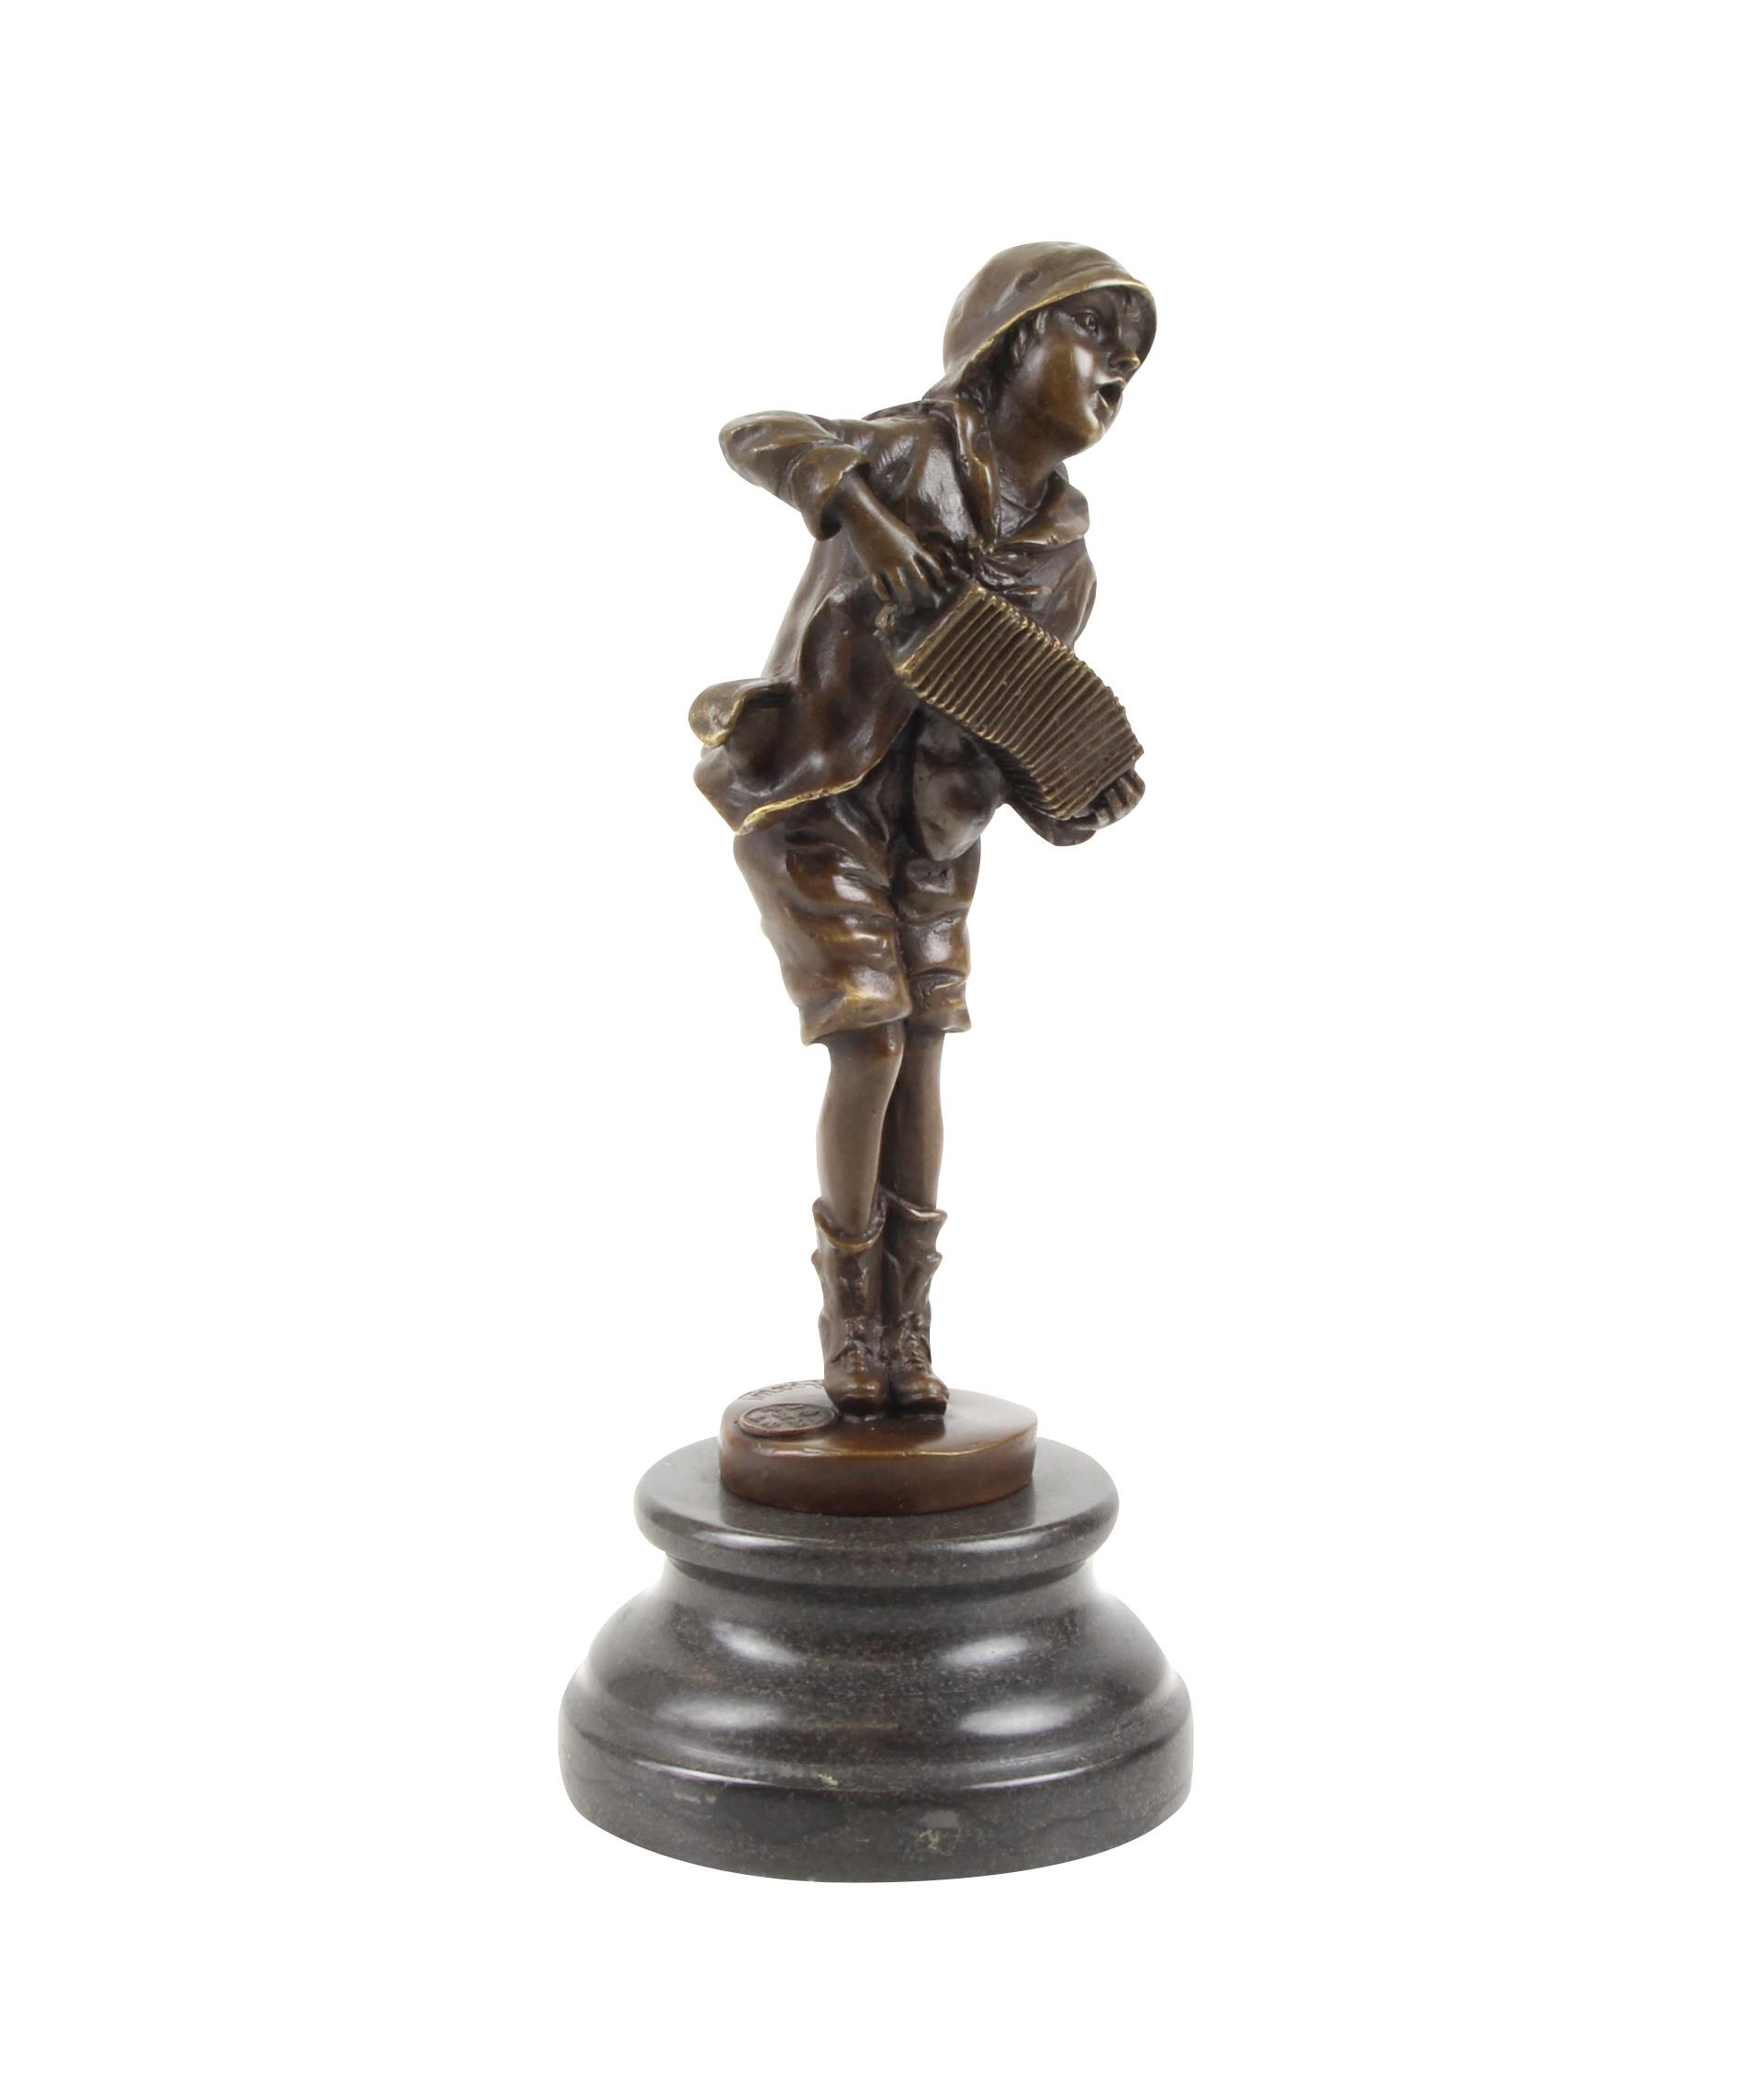 bronzeskulptur bronze figur ziehharmonika nach chiparus antik stil replik aubaho. Black Bedroom Furniture Sets. Home Design Ideas